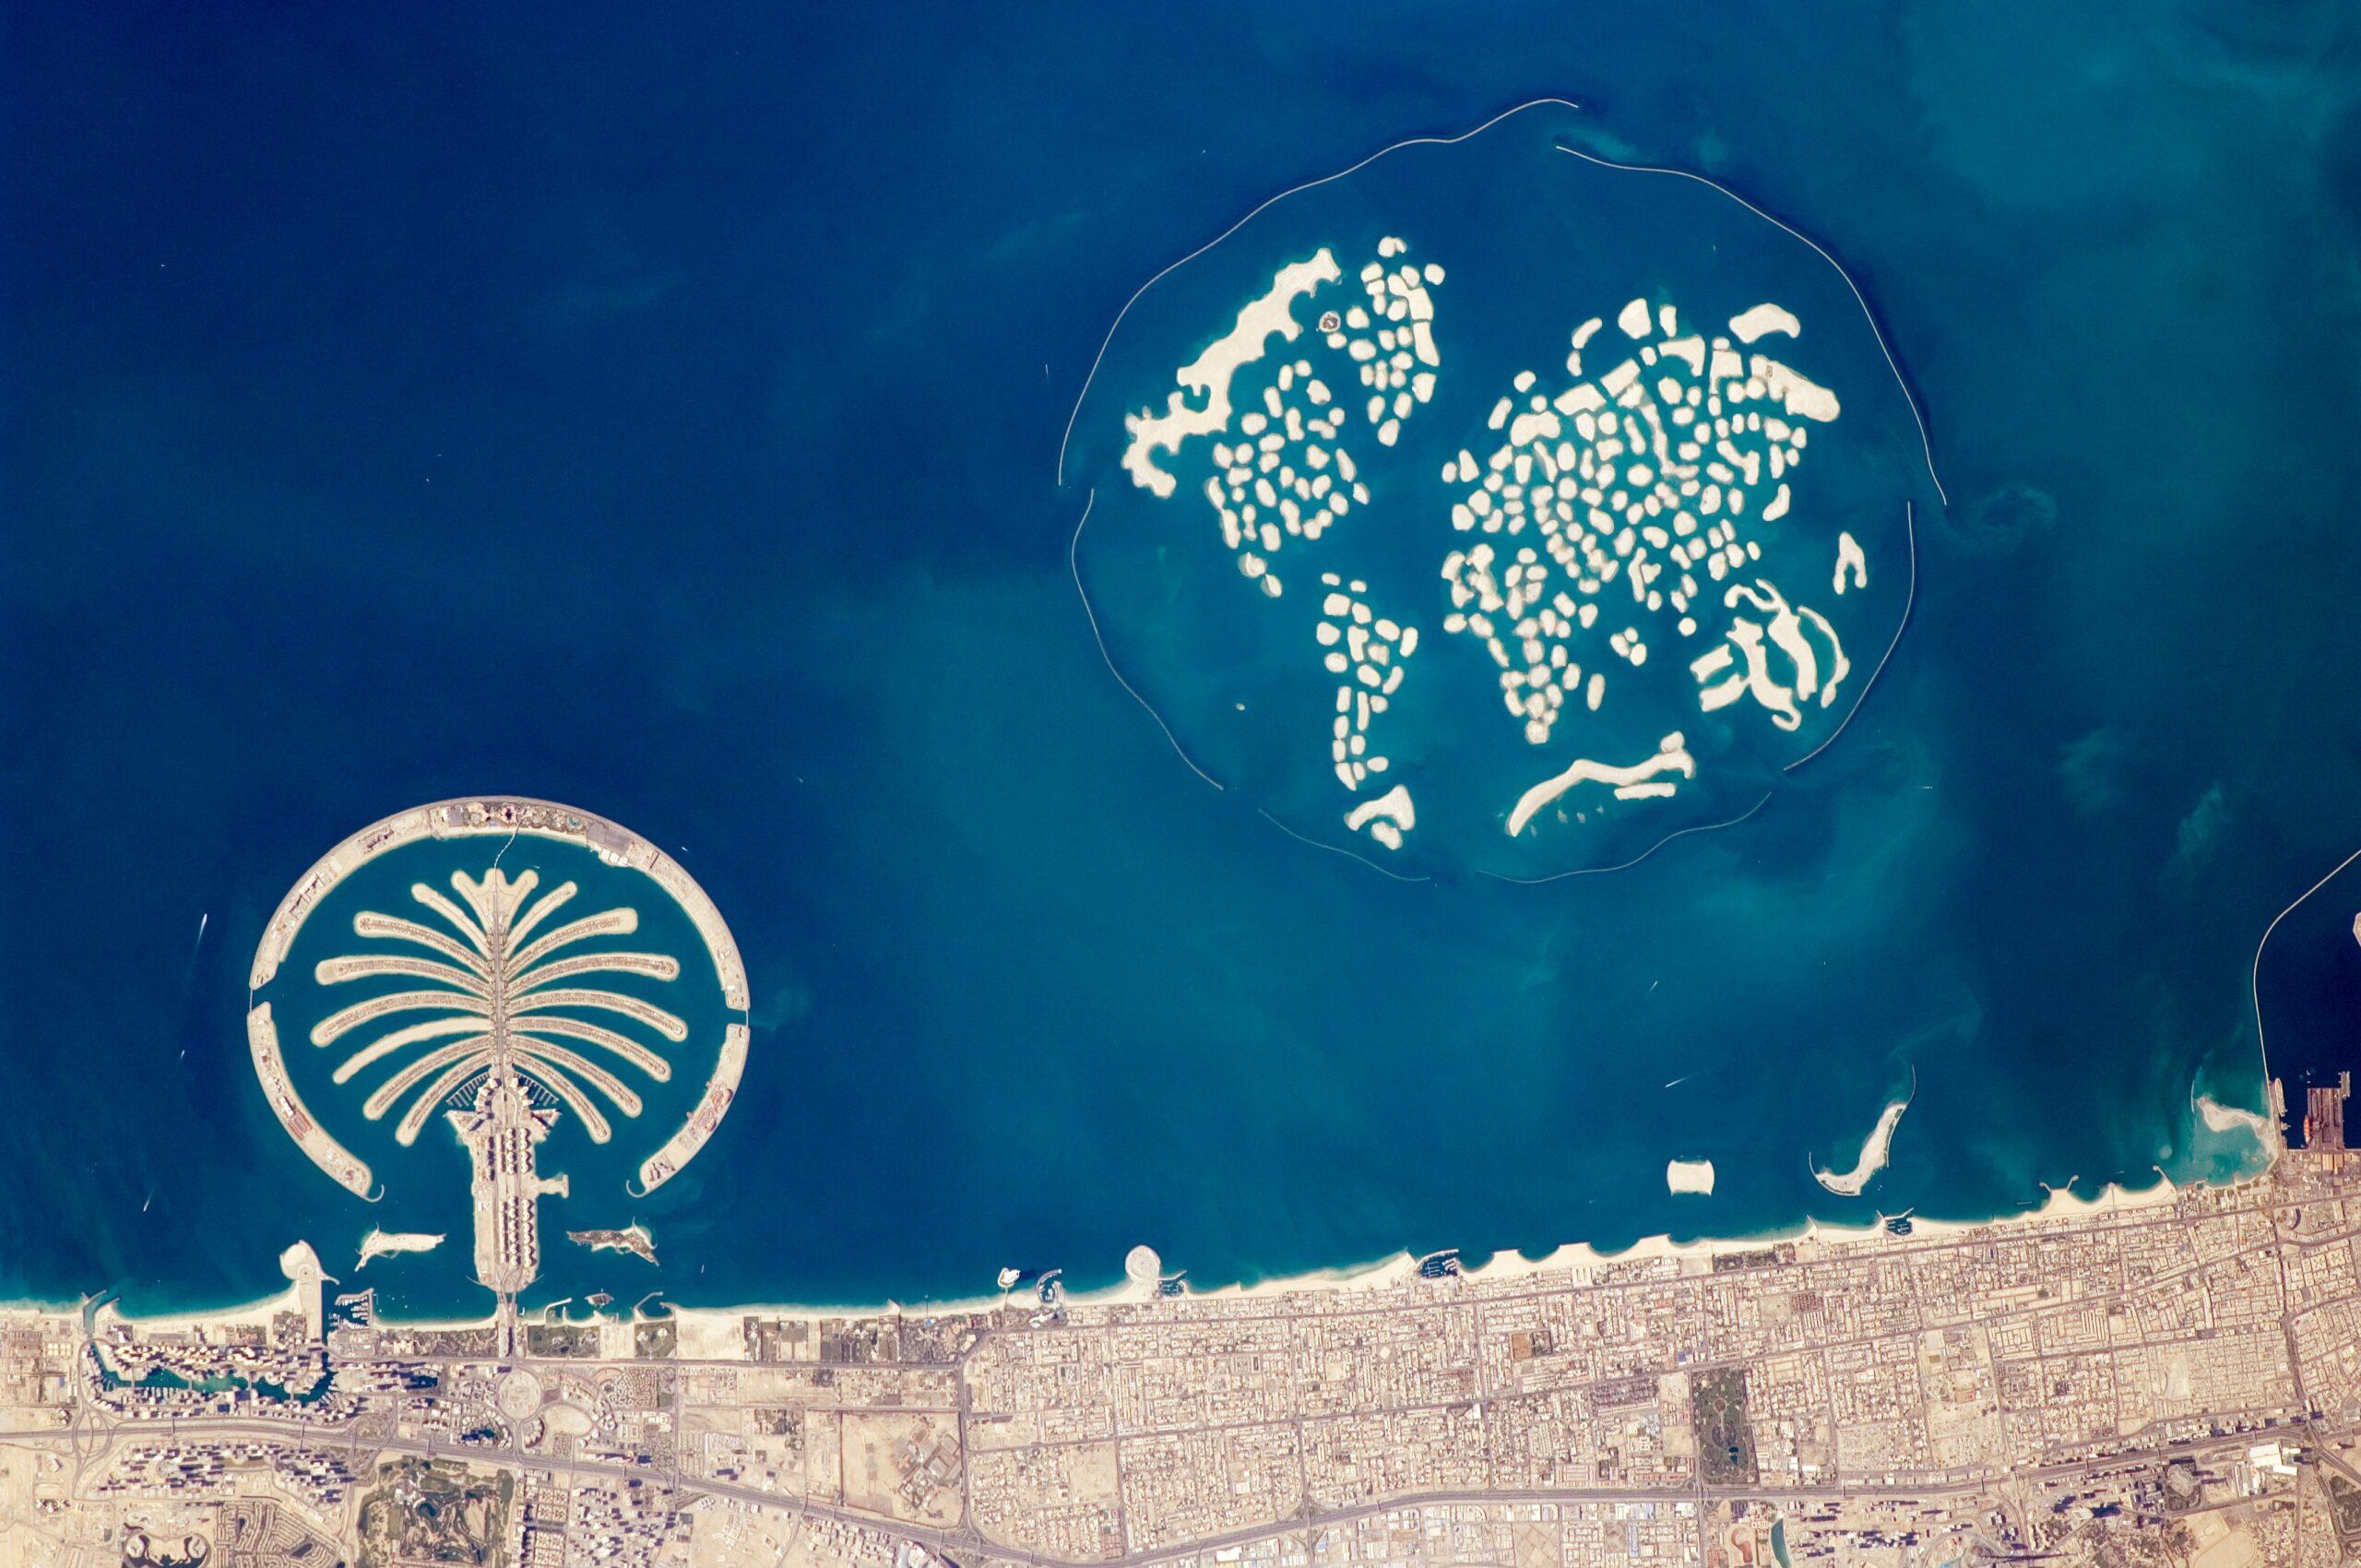 Dubai Tour 2016 artificial_archipelagos,_dubai,_united_arab_emirates_iss022-e-024940_lrg